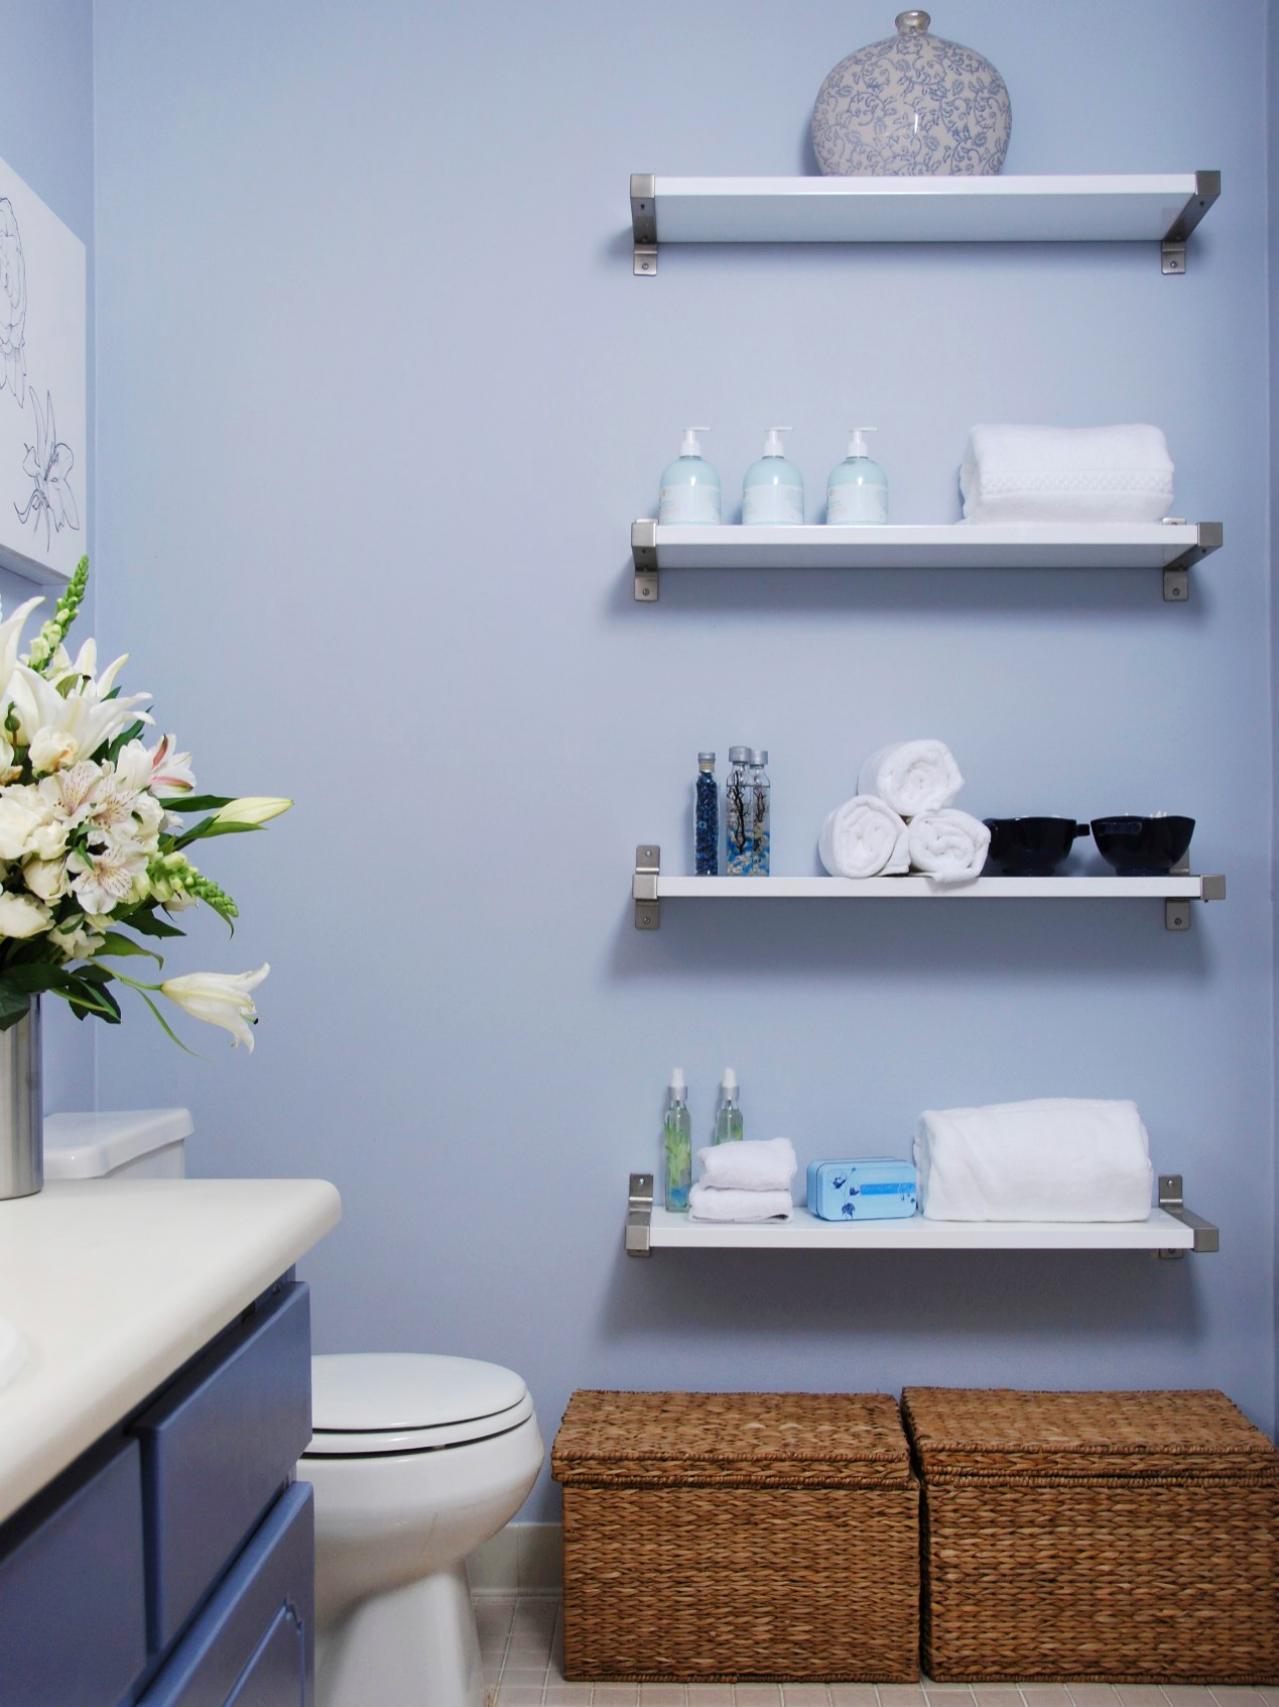 ways decorate with floating shelves decorating bathroom storage contemporary line blue wall industrial decorative ideas living room wire shelf brackets espresso home garage